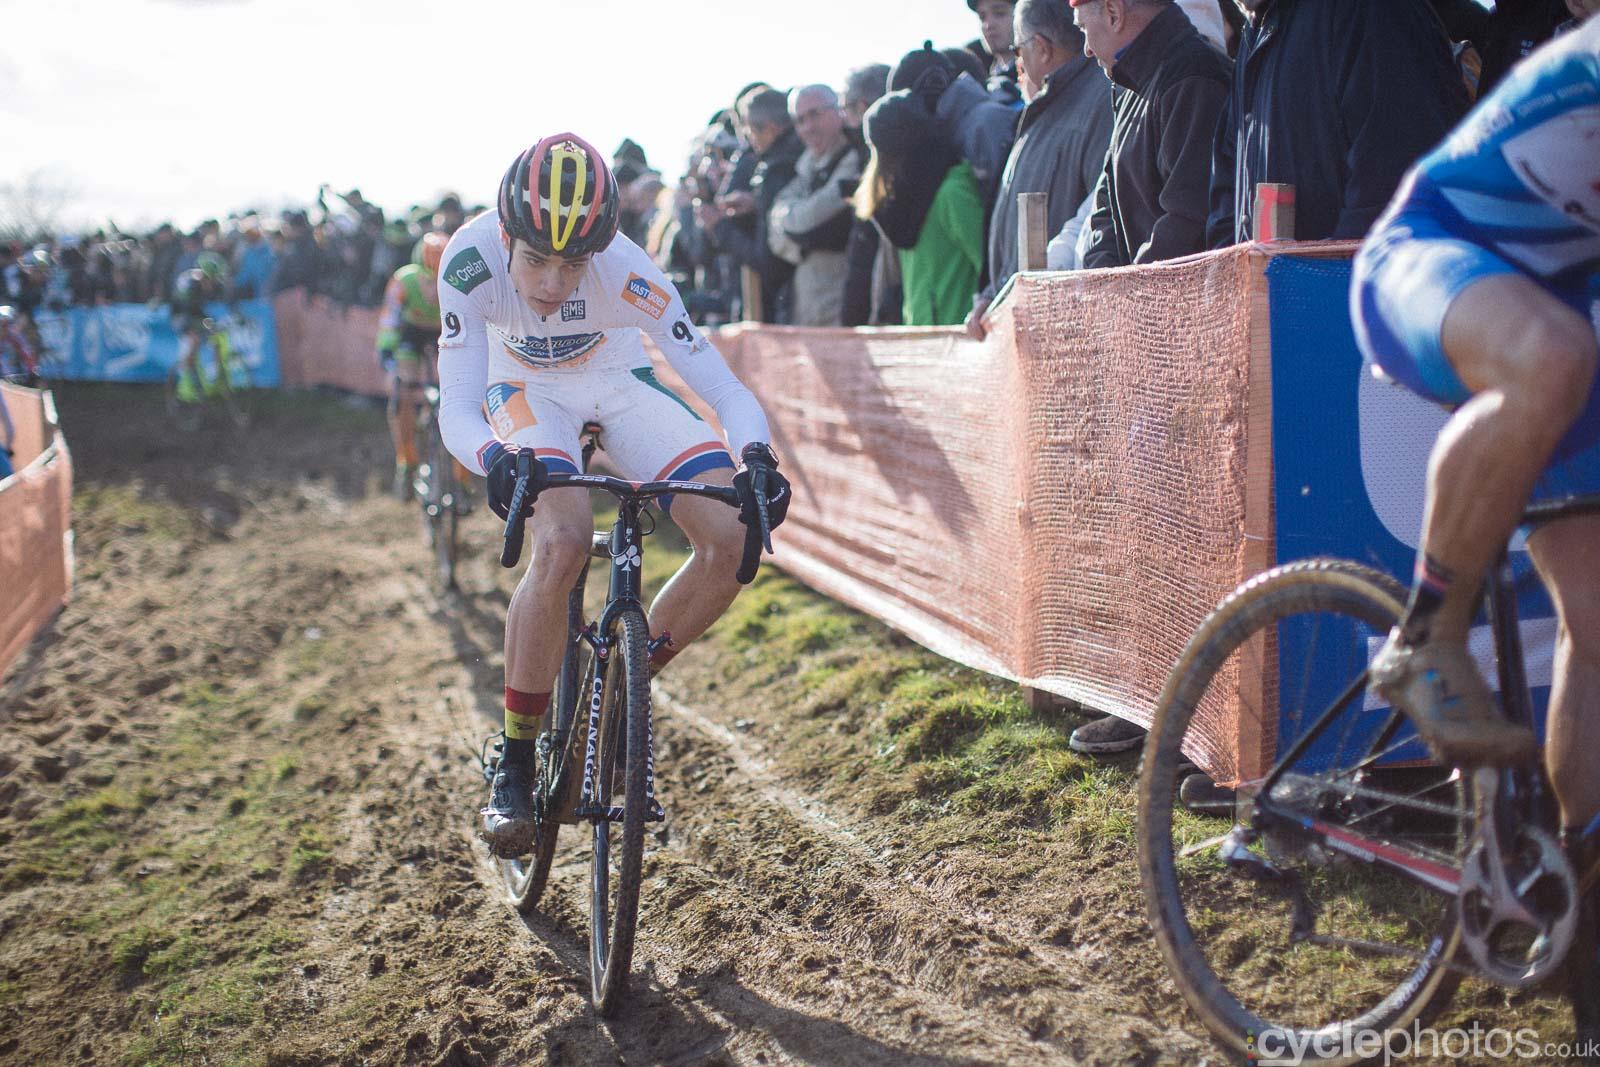 2016-cyclephotos-cyclocross-lignieres-150115-wout-van-aert